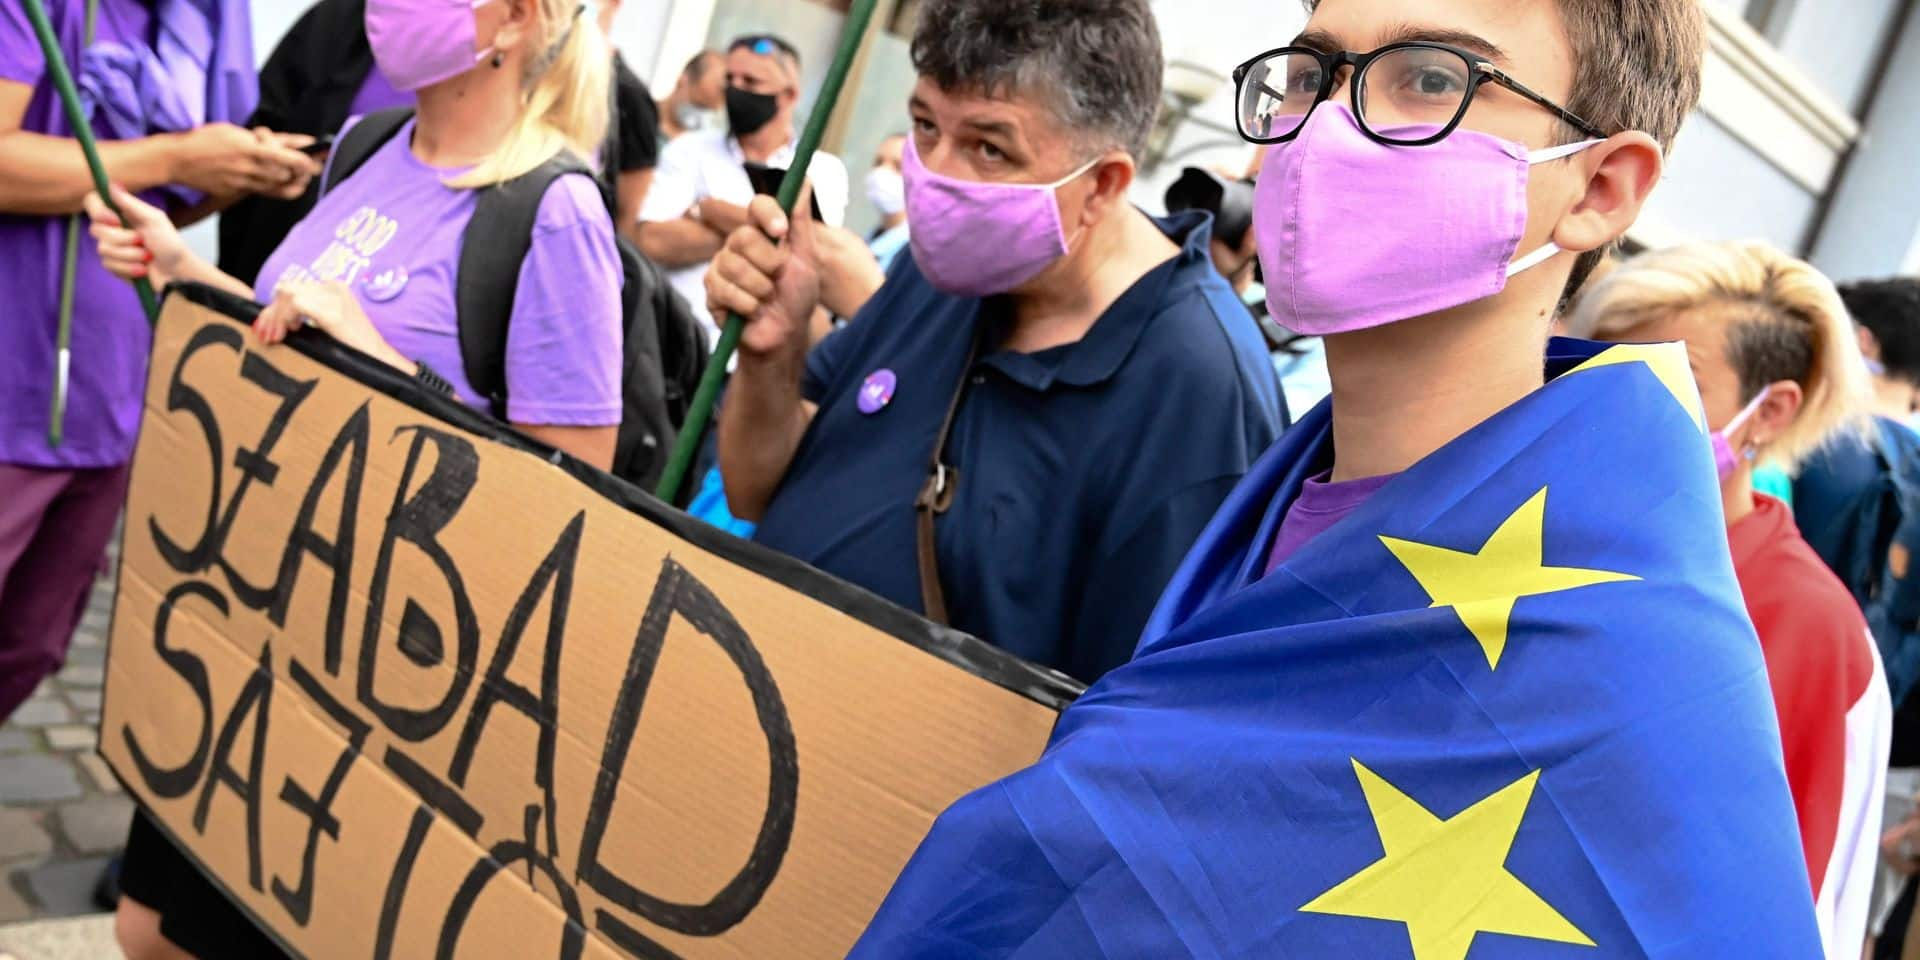 La Hongrie étouffe la presse indépendante, l'Europe reste immobile